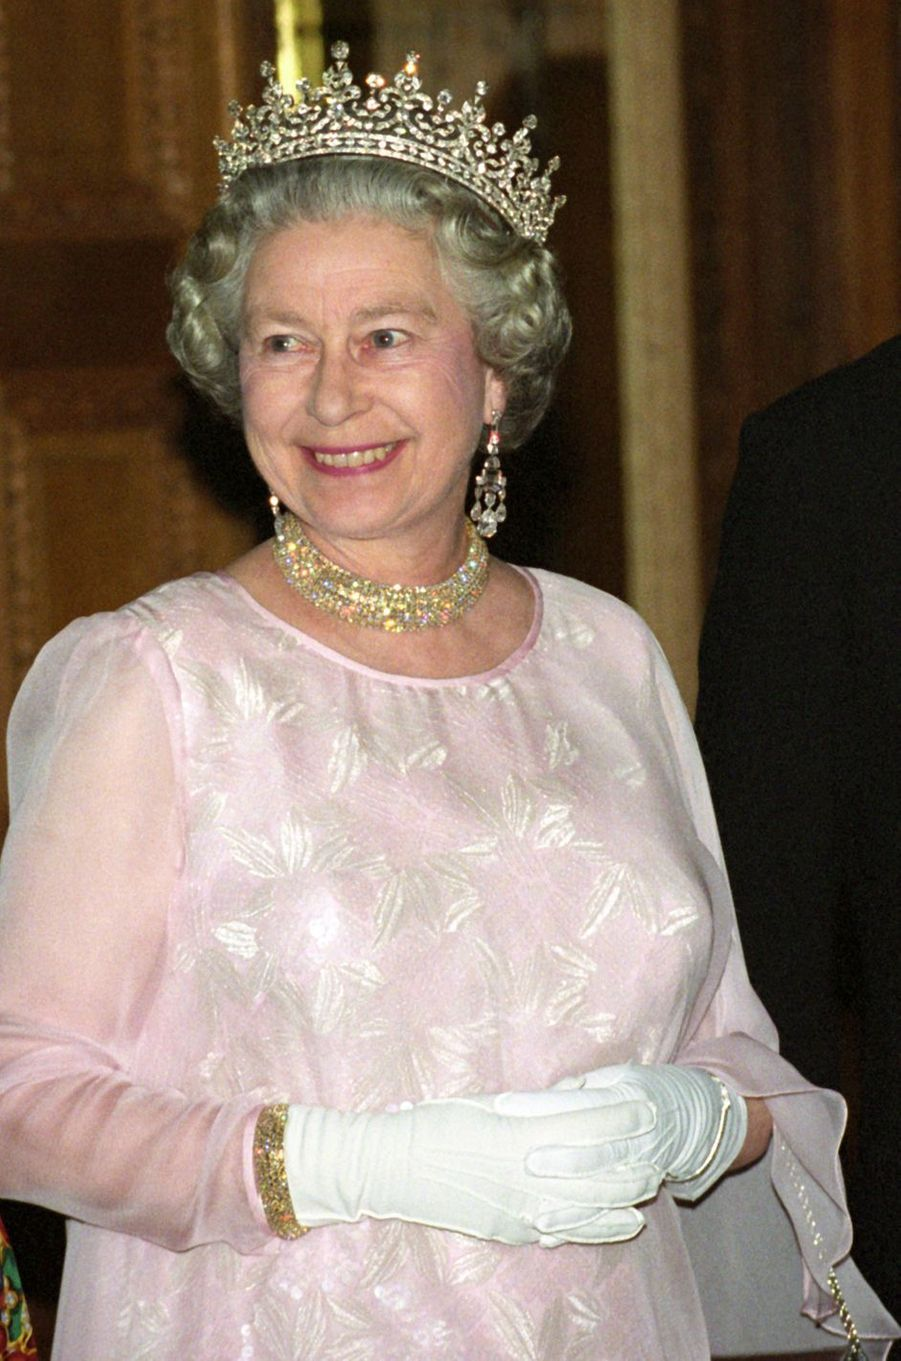 La reine Elizabeth II à Berlin, le 21 octobre 1992